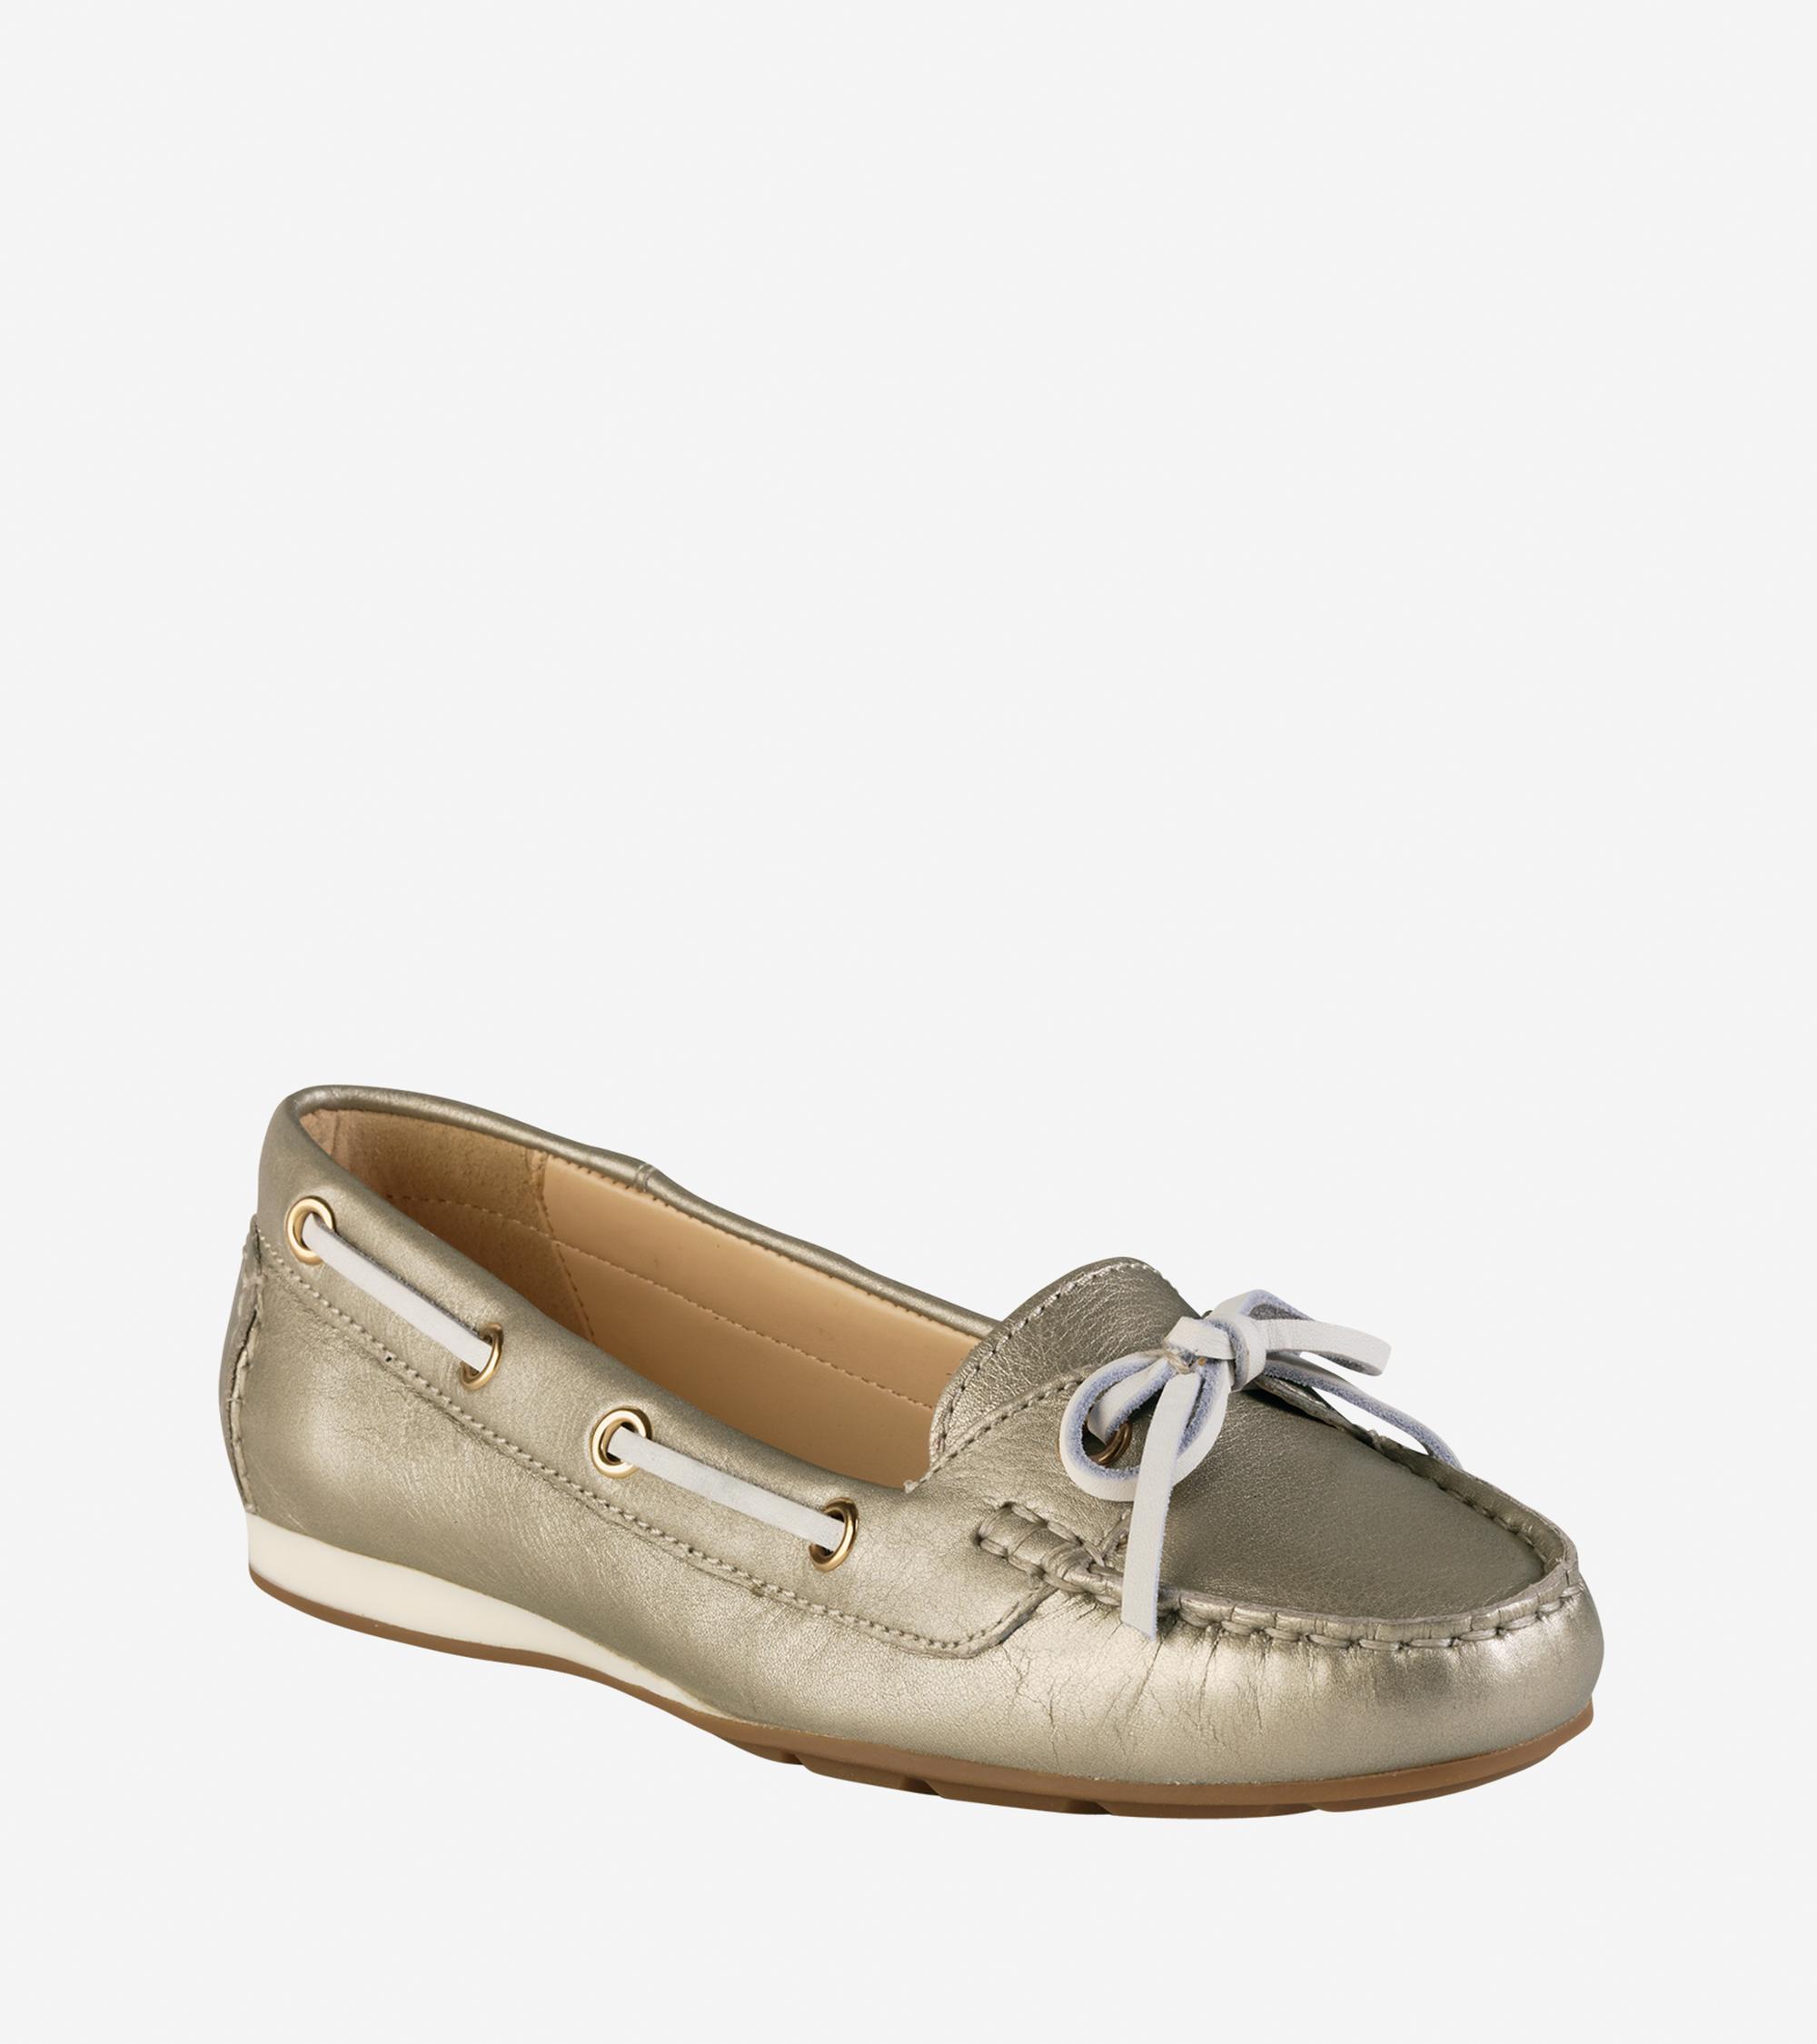 cole haan tali boat shoe in white lyst